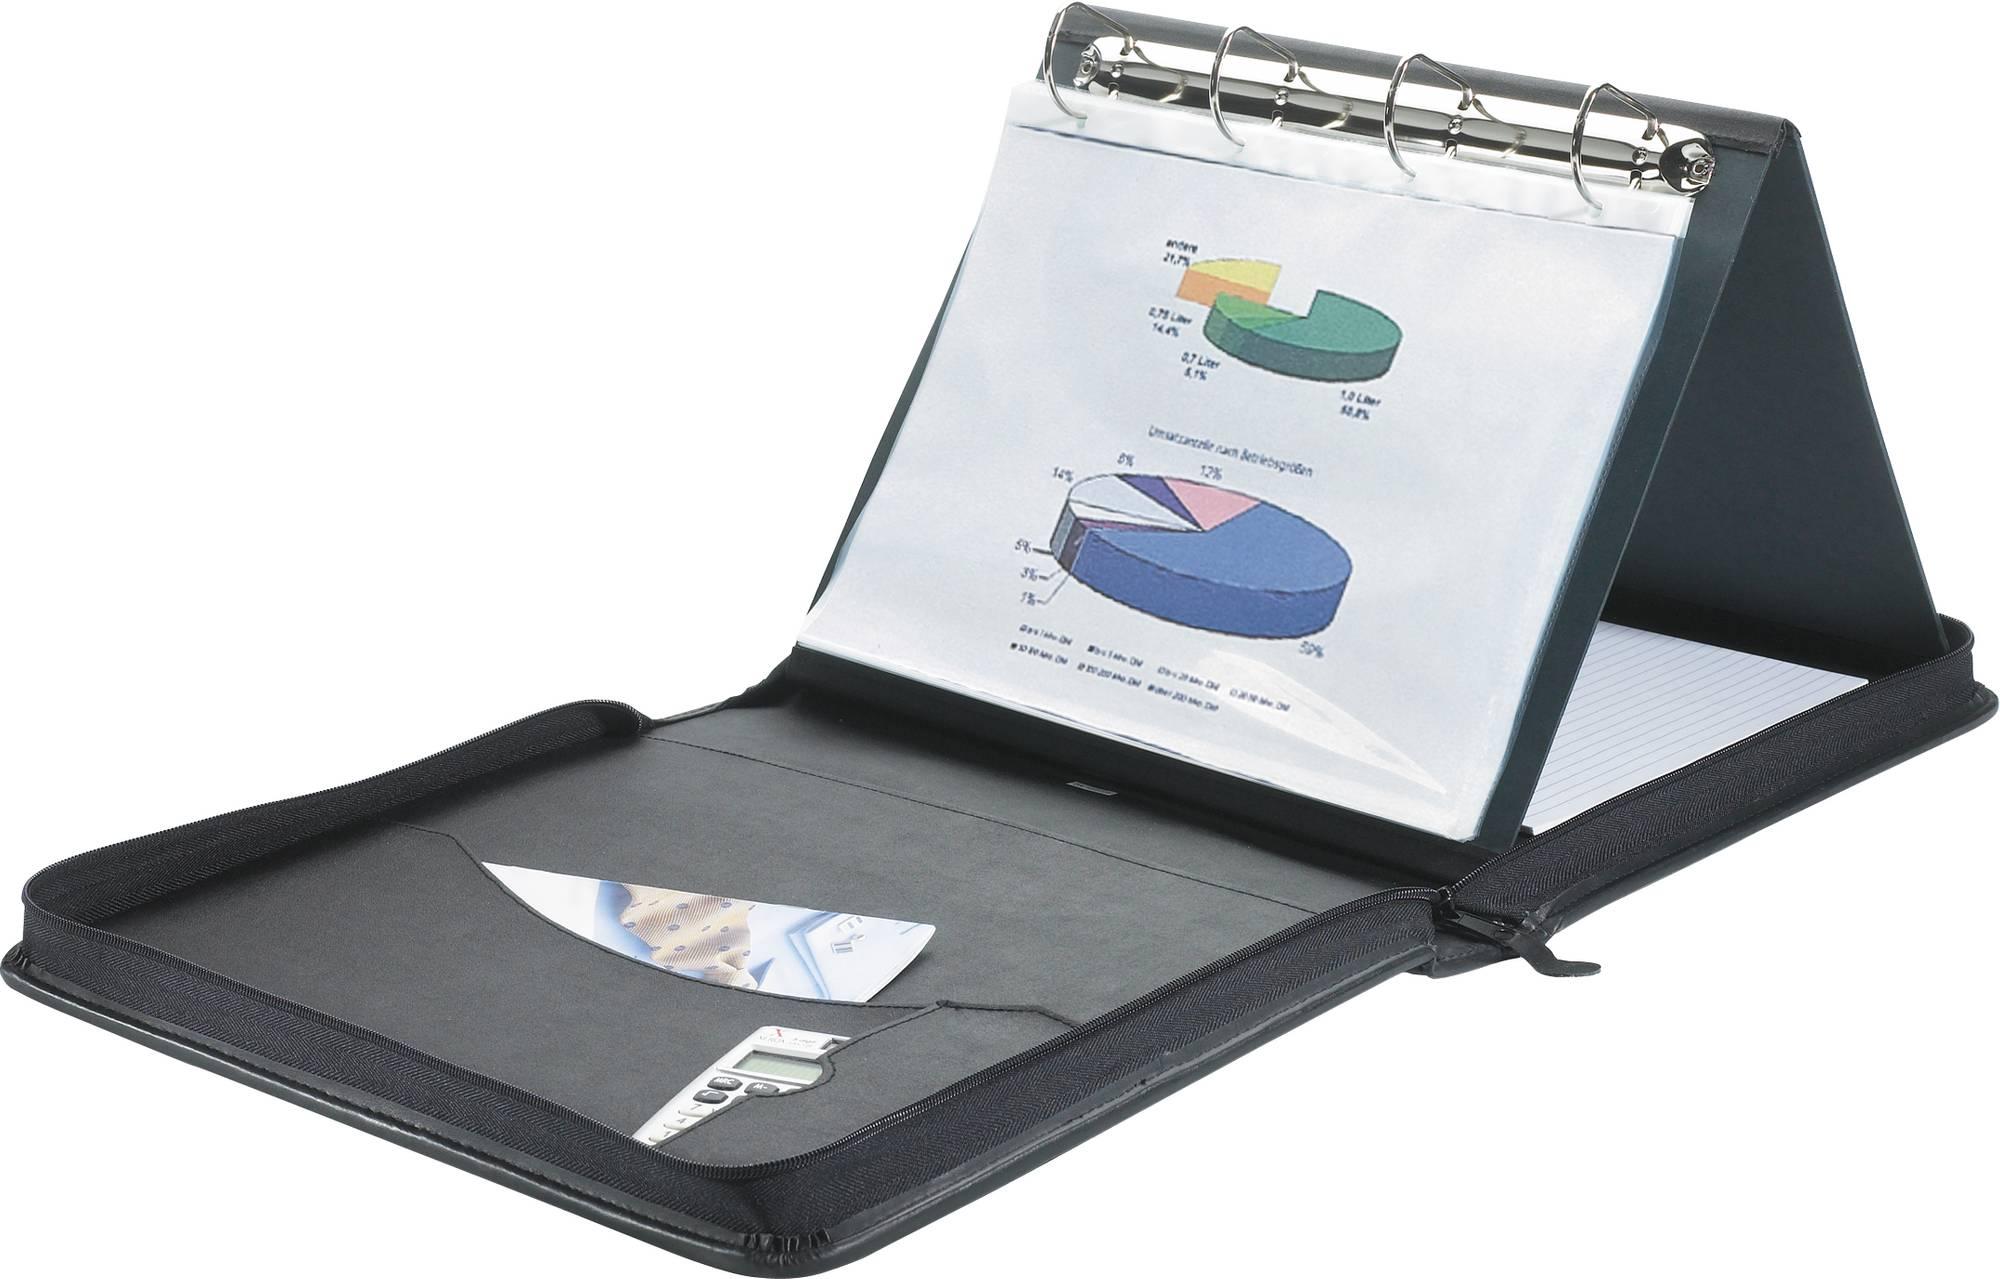 Tragbare Flipchart-Mappe Präsentationsringbuch für DIN A4 Formate aus hochwertigem Kunstleder